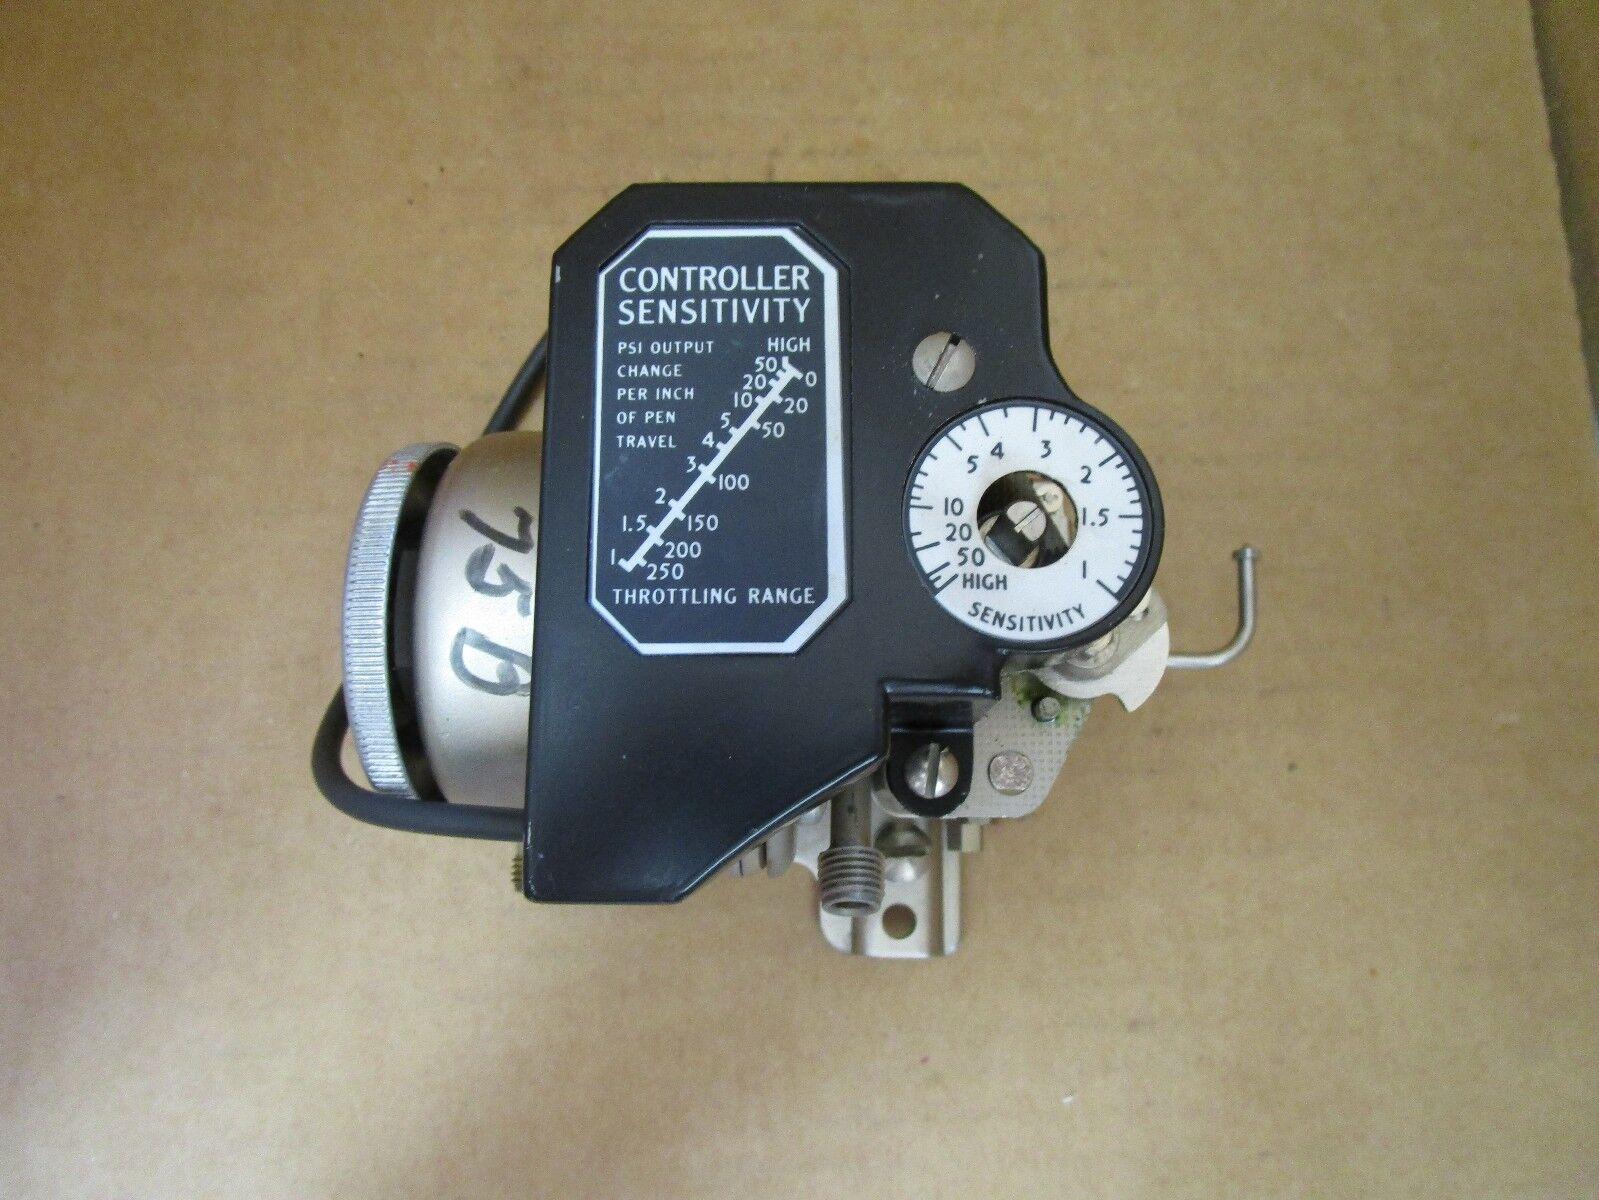 Taylor Controlador sensibilidad 1-50 S-12 Rh Izquierda 58s37b 58s37b 58s37b 2dfc85